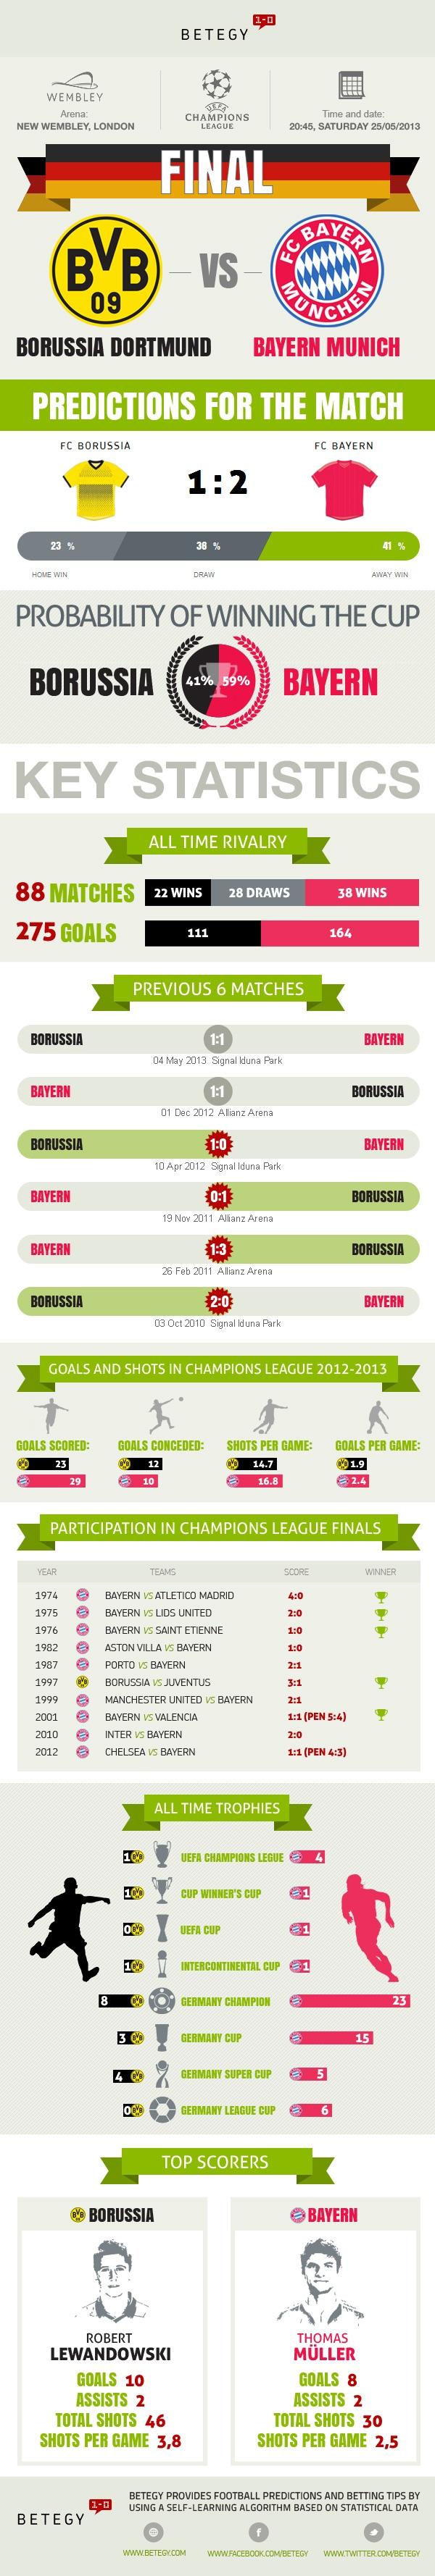 UEFA Champions League Final  Borussia Dortmund v Bayern Munich  25/05/13